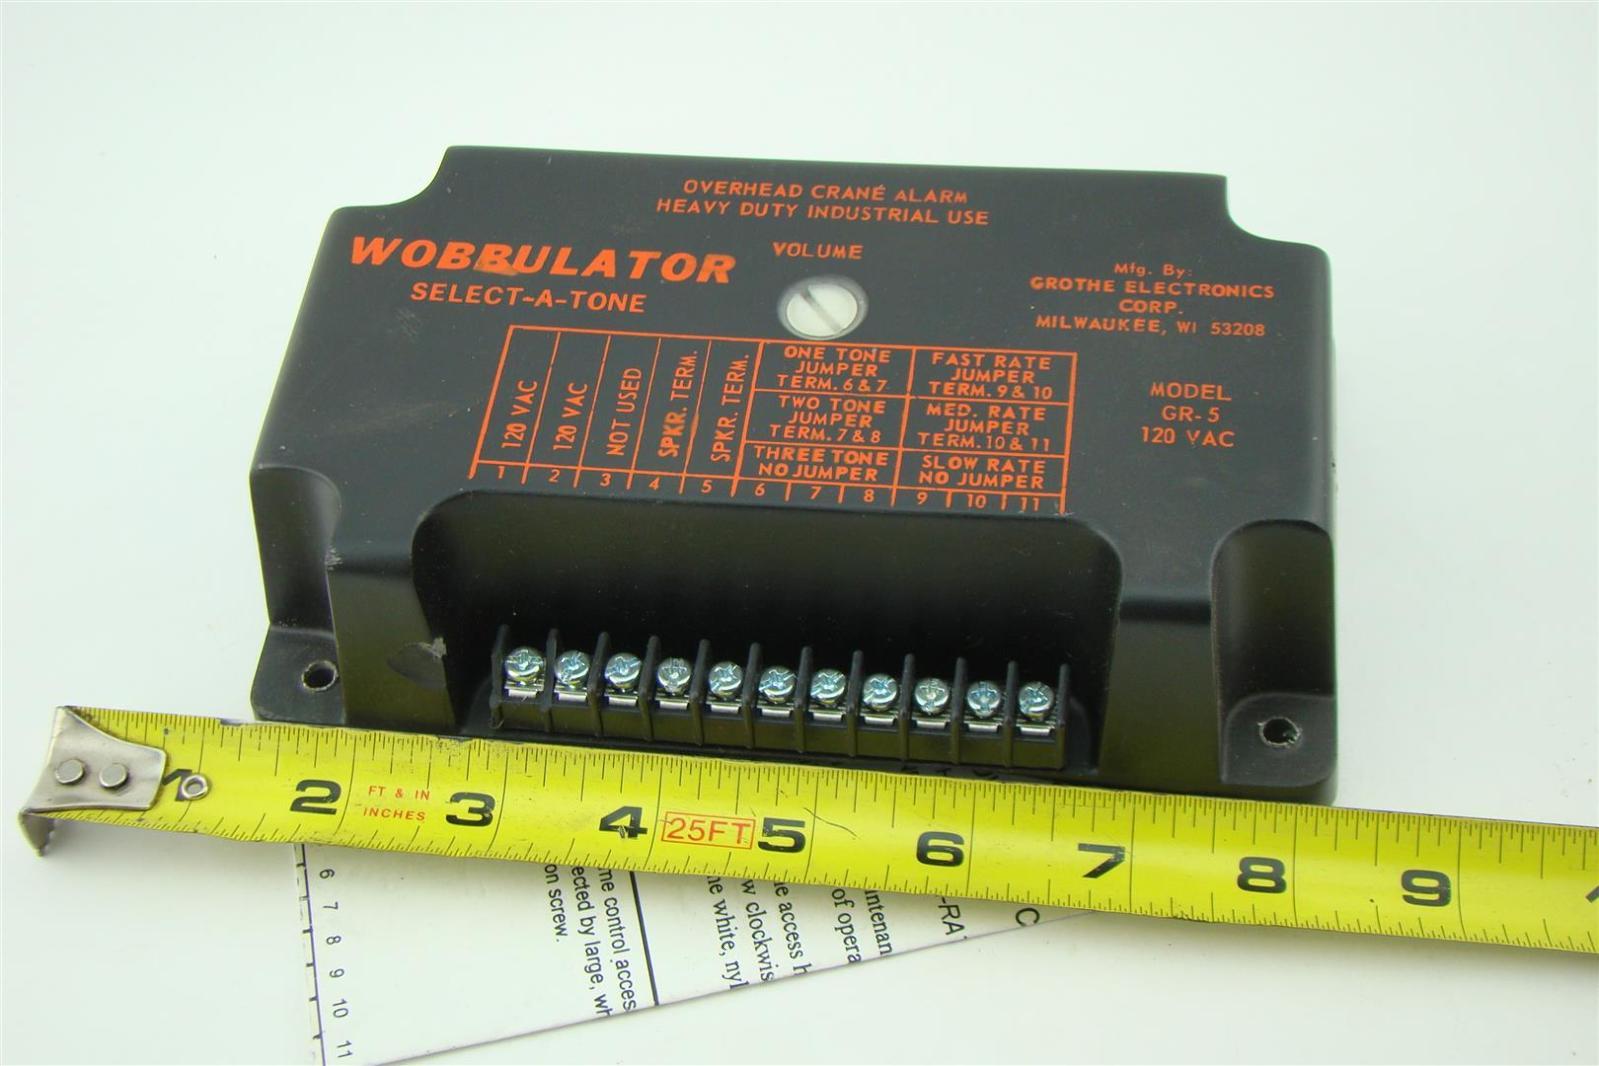 wobbulator siren wiring diagram wiring rh westpol co Code 3 Siren Wiring-Diagram Galls Siren Wiring-Diagram